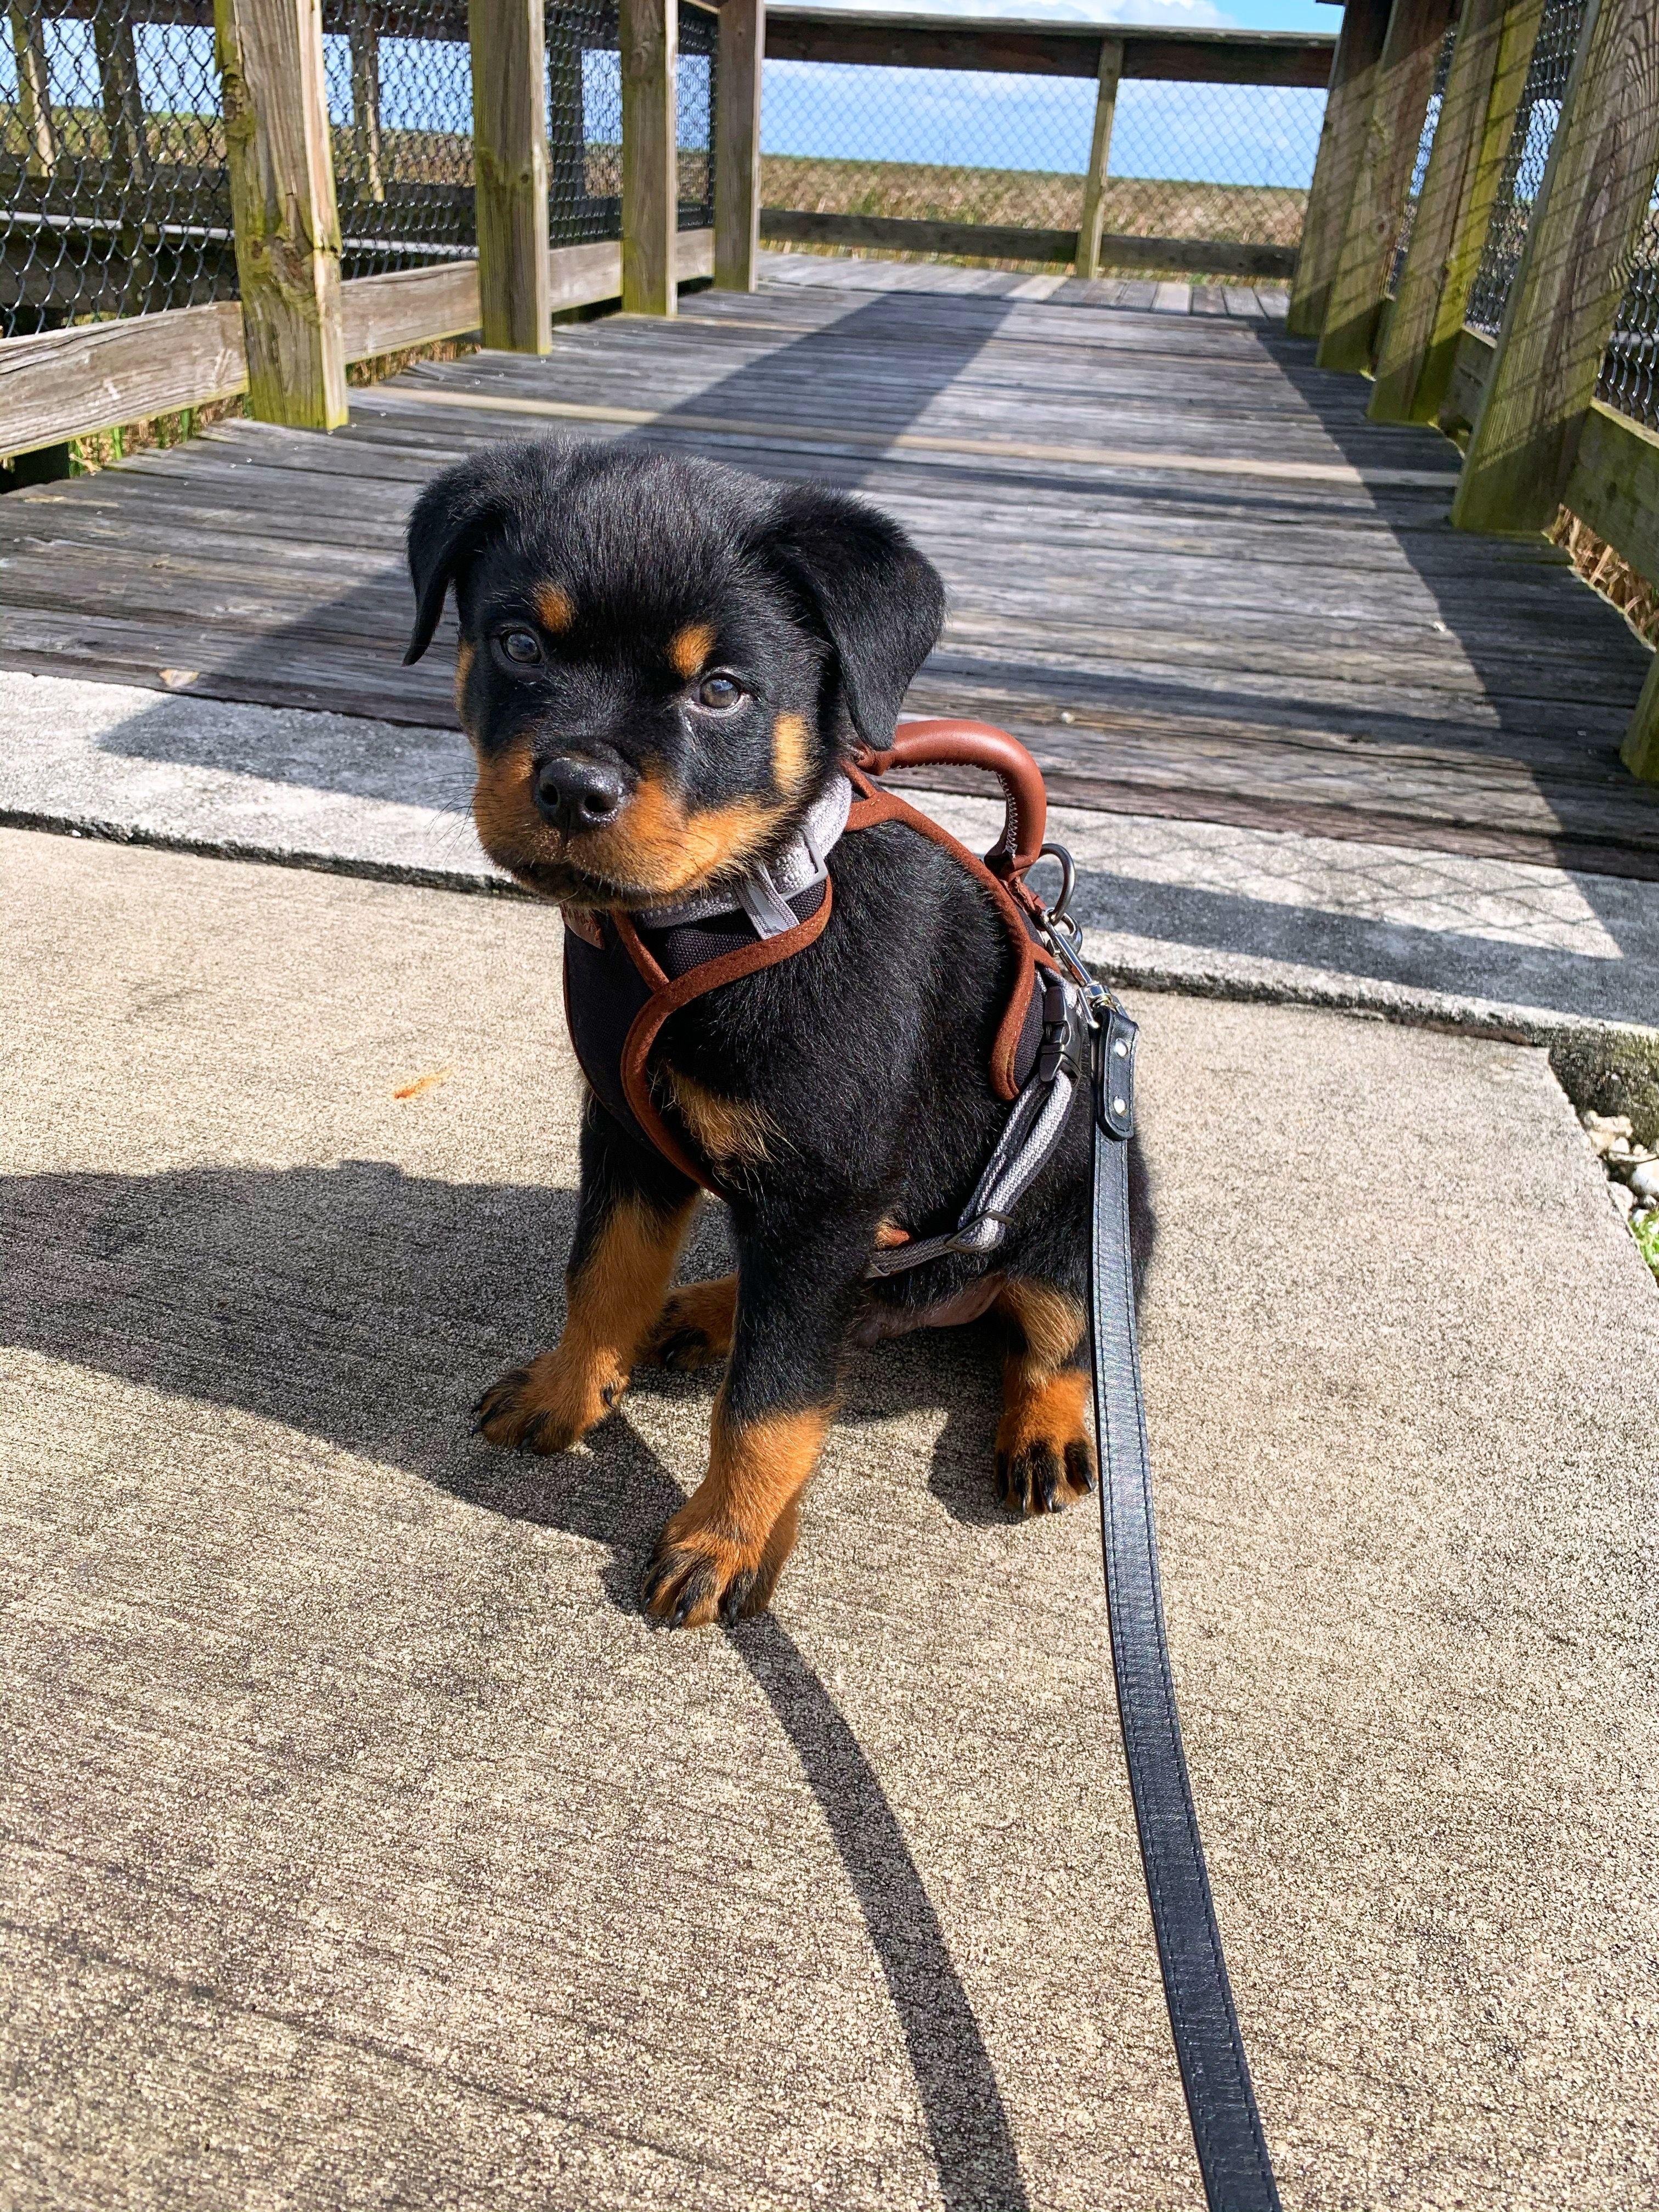 Cutest Rottweiler Puppies 🥰 Rottweiler puppies for sale